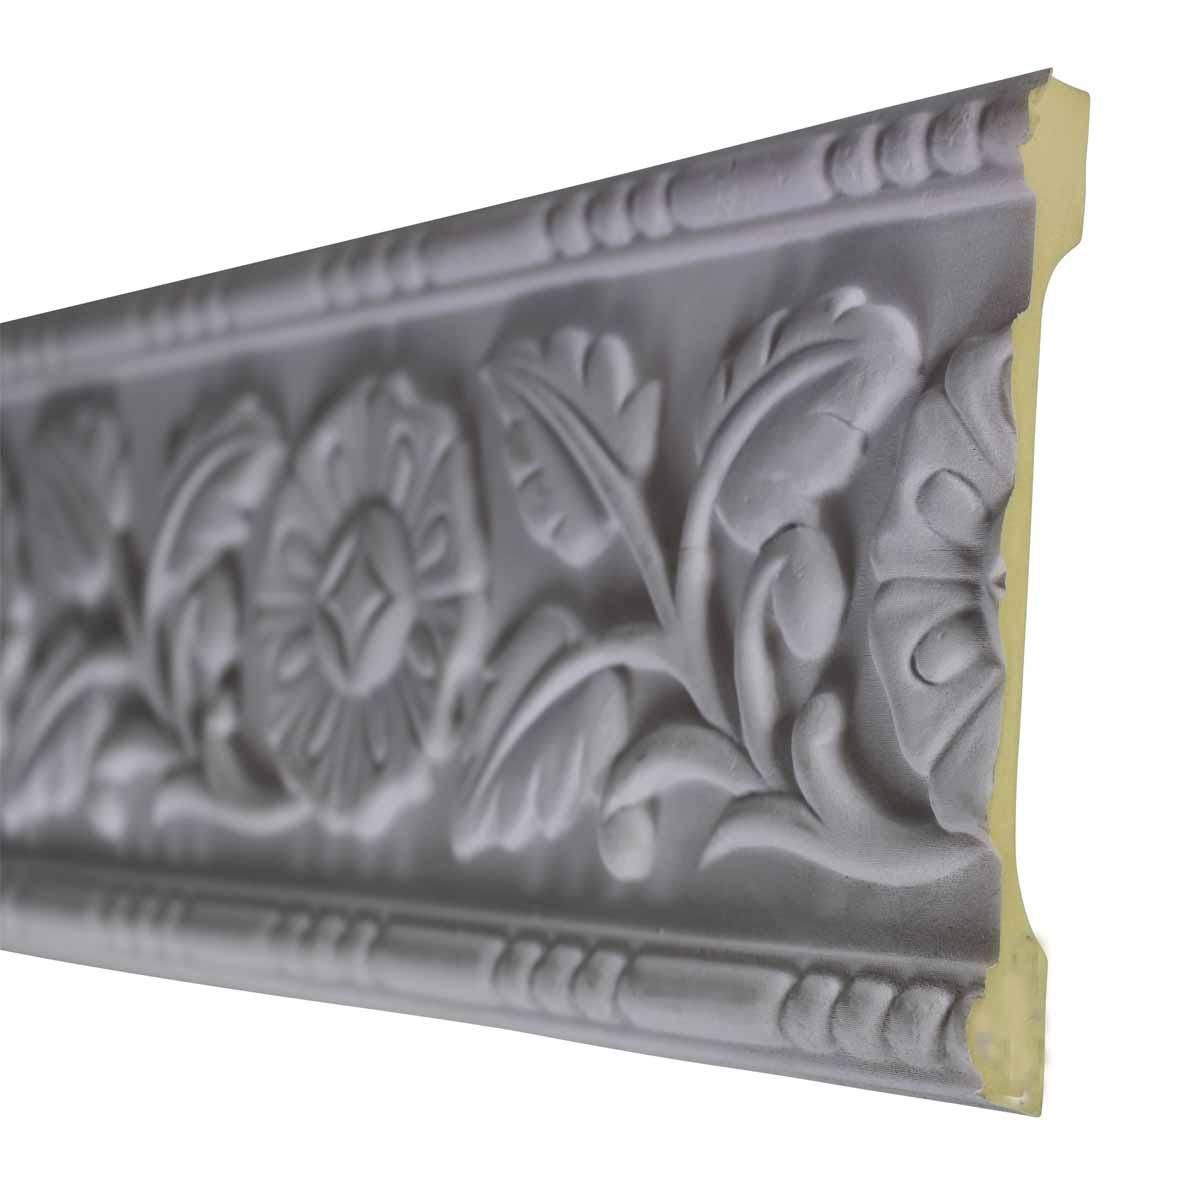 Cornice Withe Urethane Sample of 12336 24 Cornice Cornice Moulding Cornice Molding